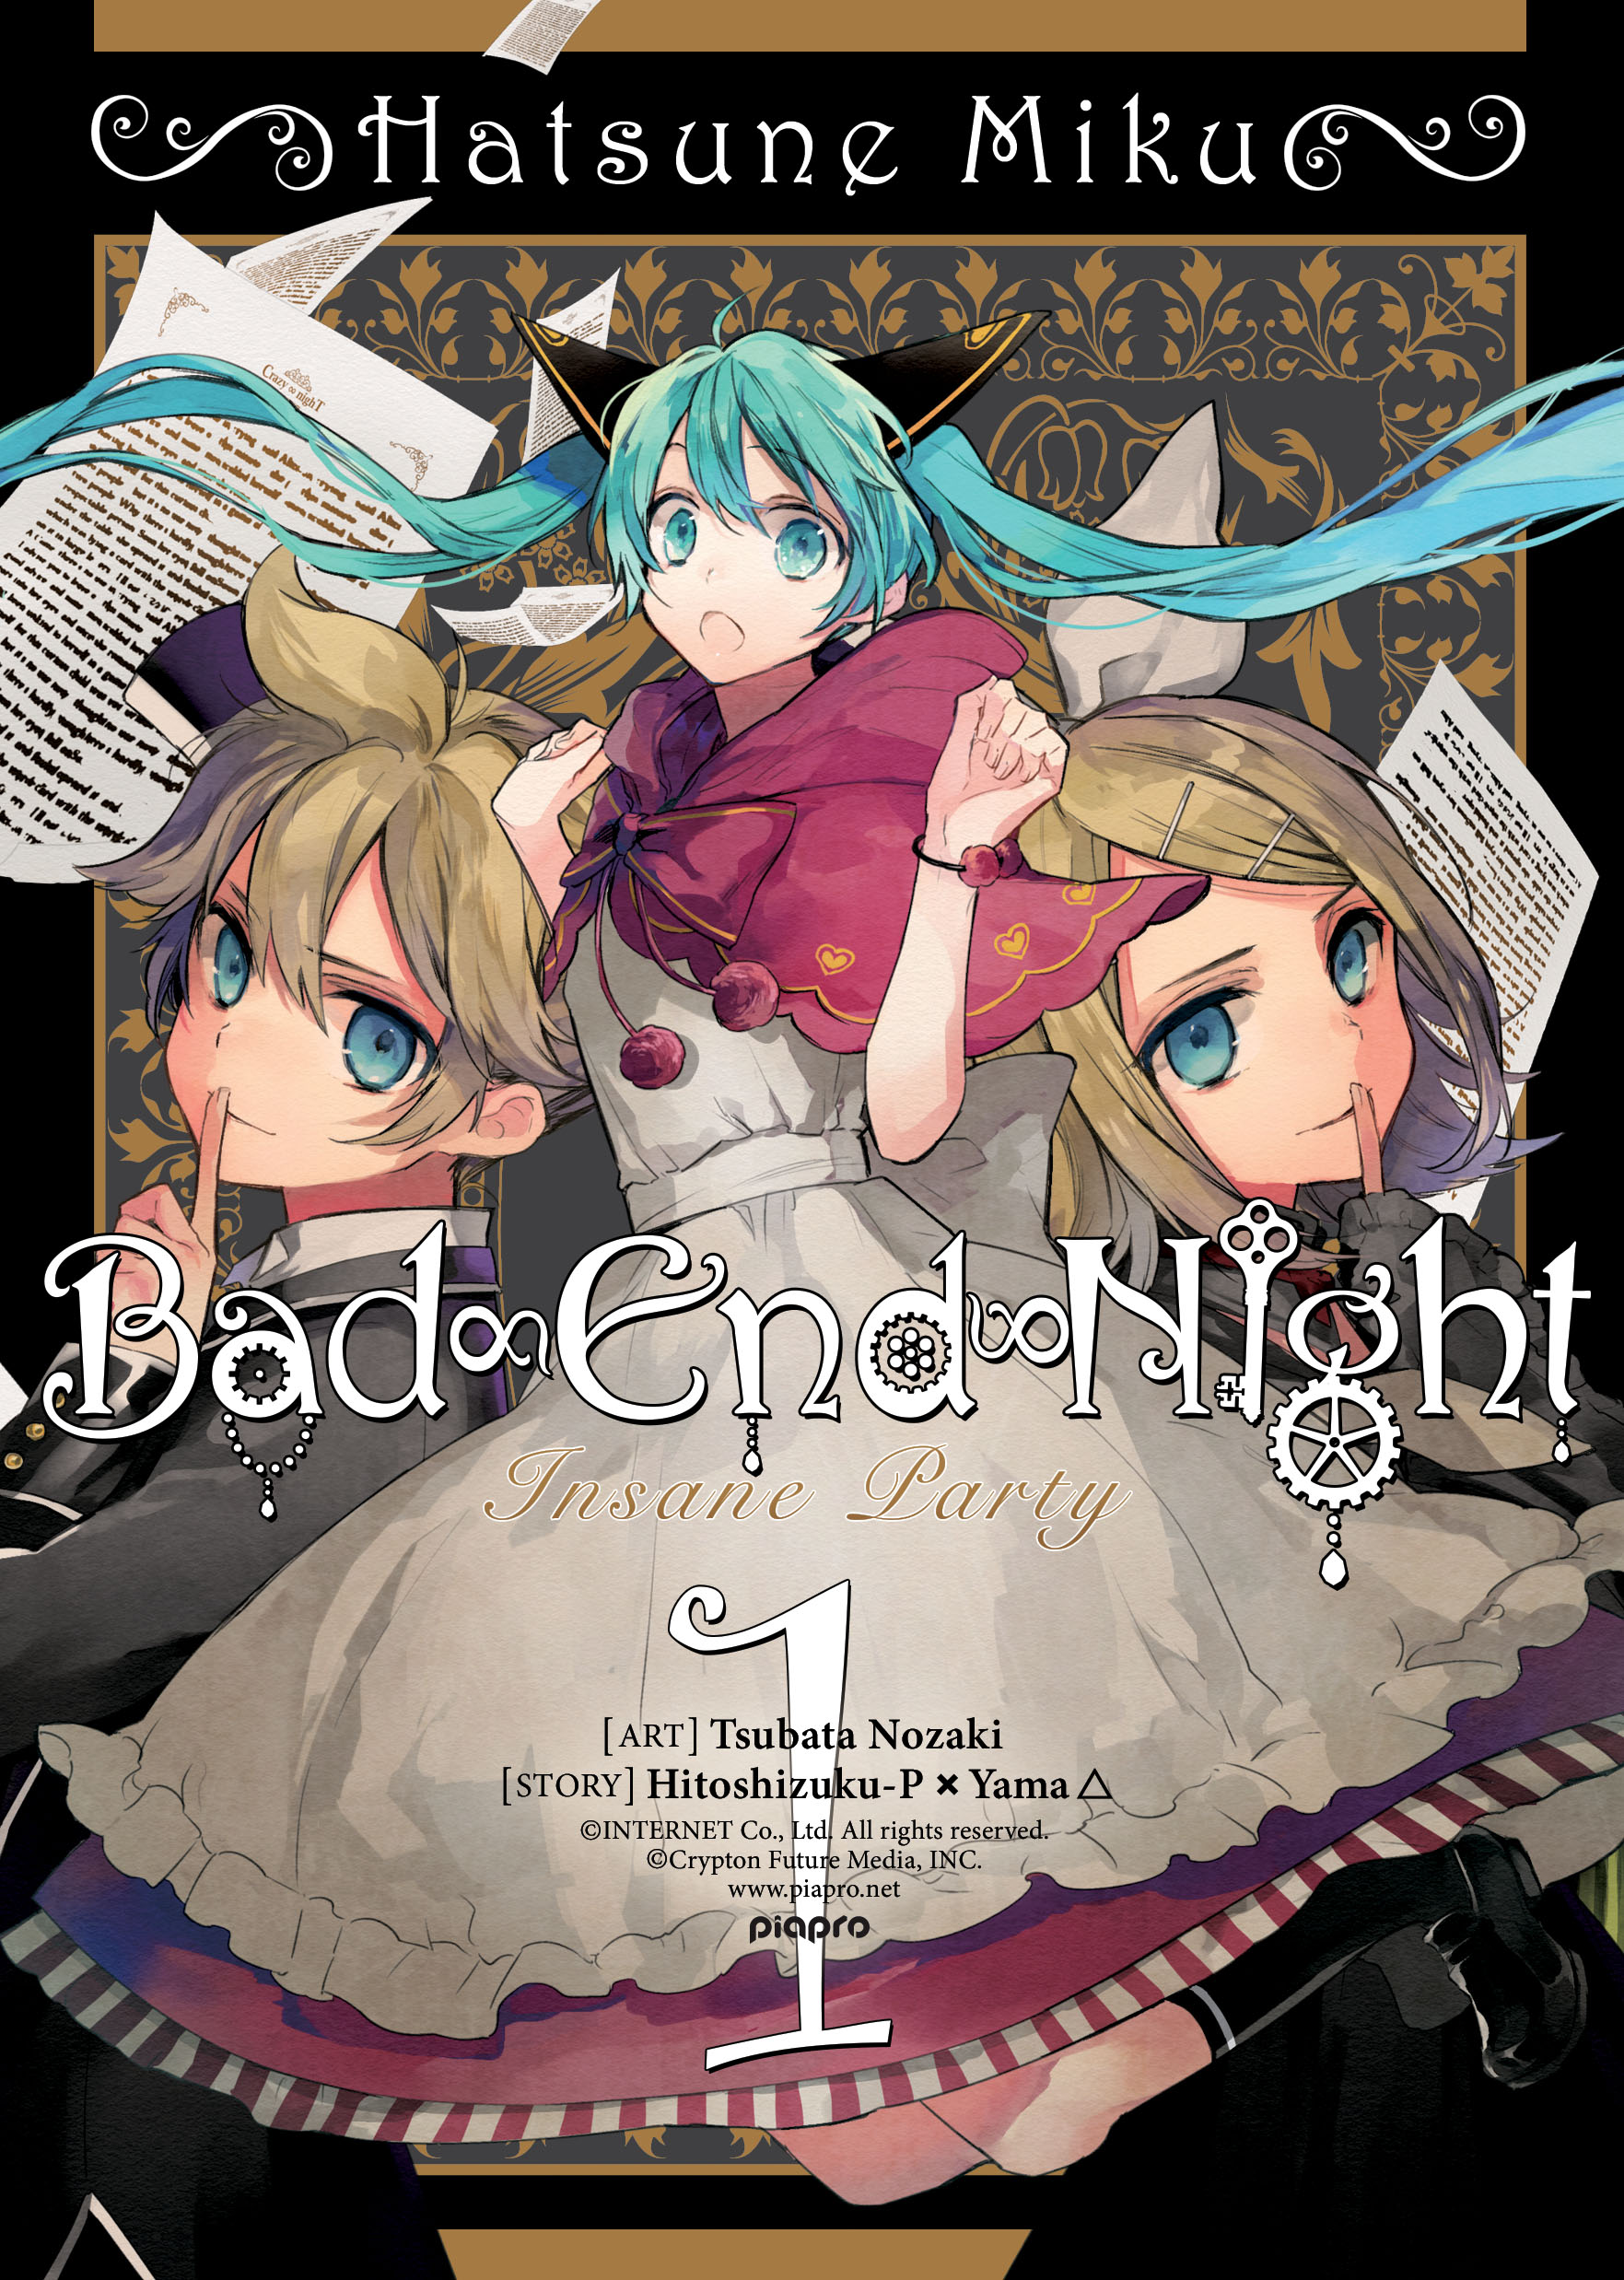 hatsune miku bad end night manga volume 1